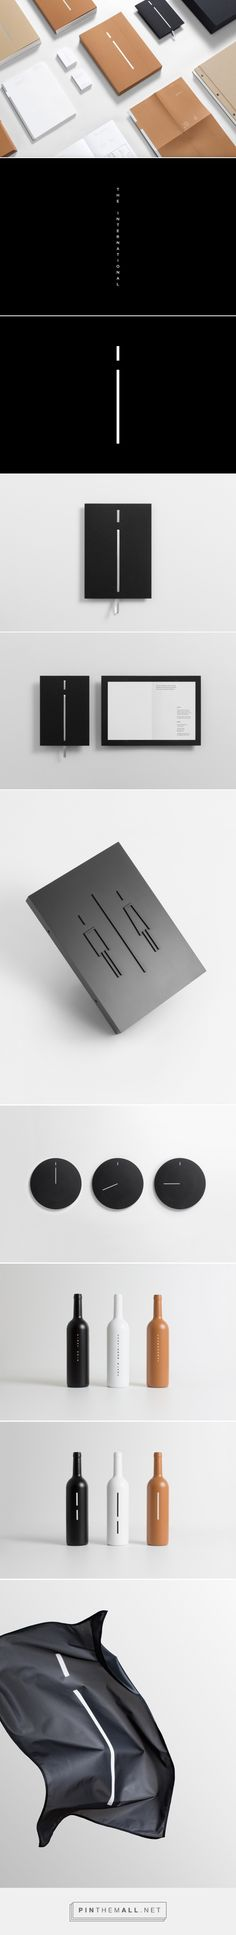 New Branding for The International by Studio South — BP&O - created via…